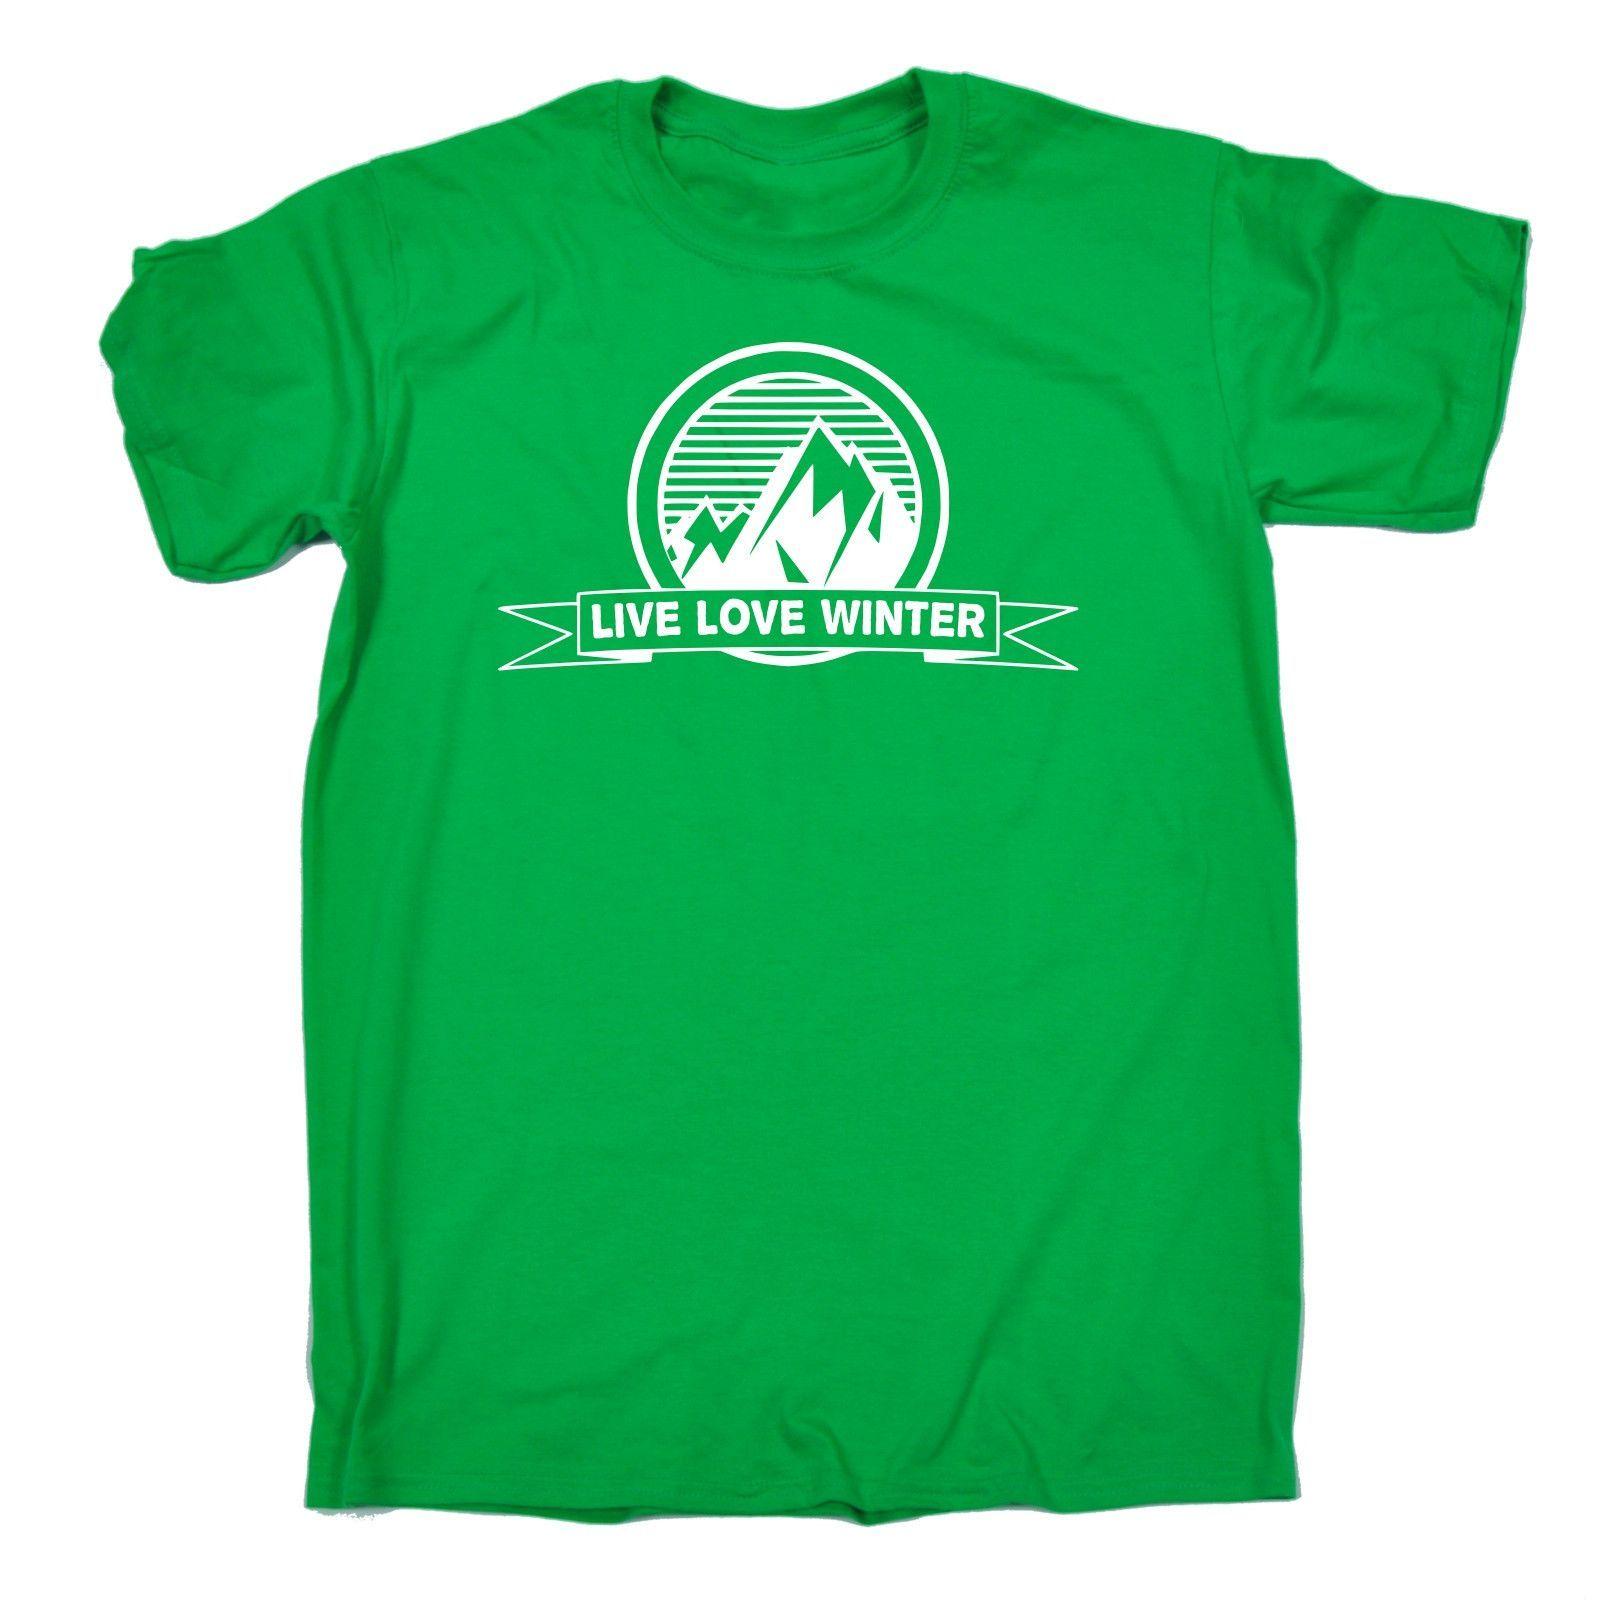 123t USA Men's Live Love Winter Funny T-Shirt